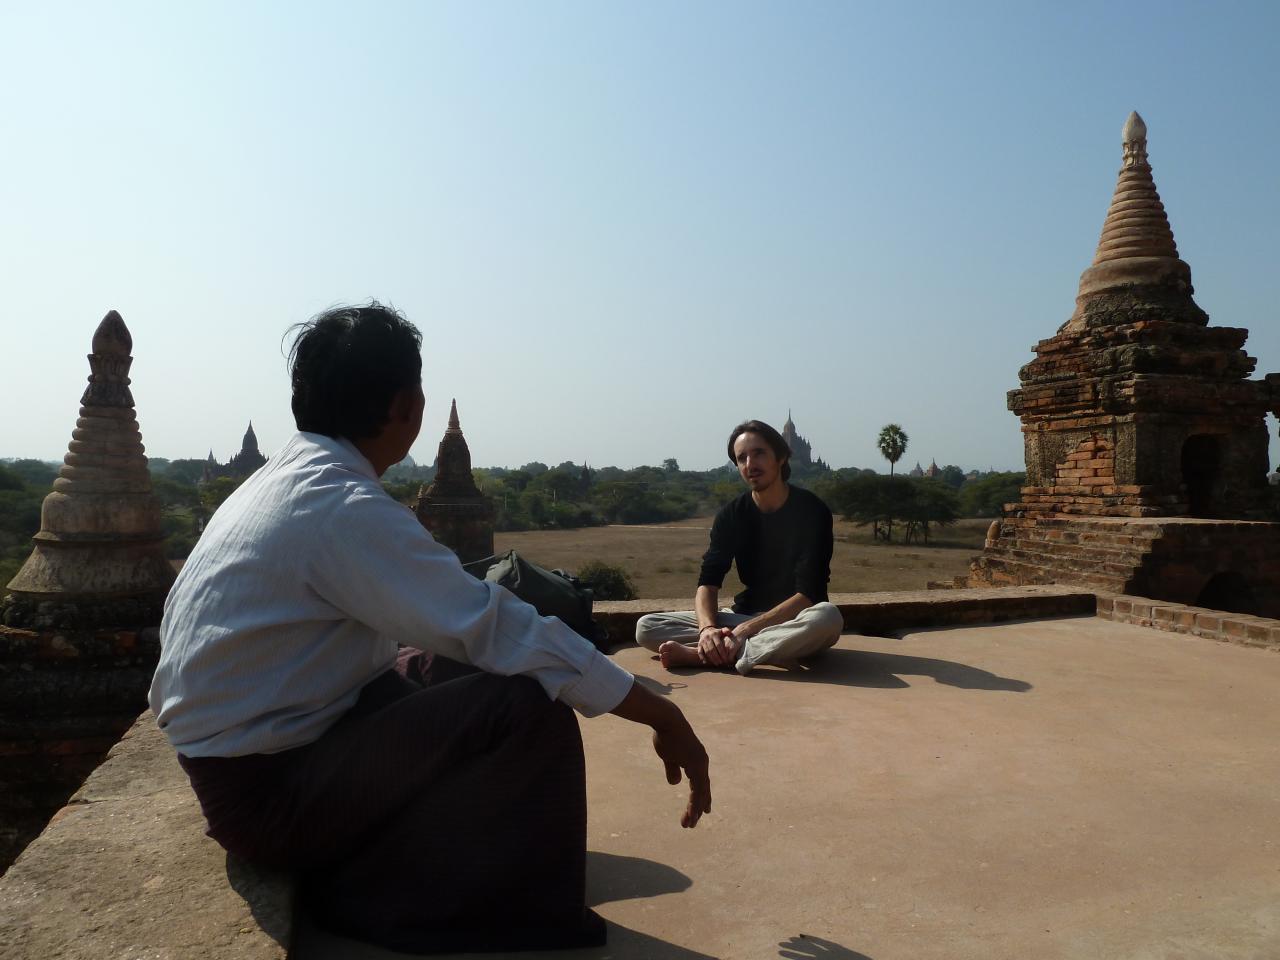 Au calme, terrasse d'un temple